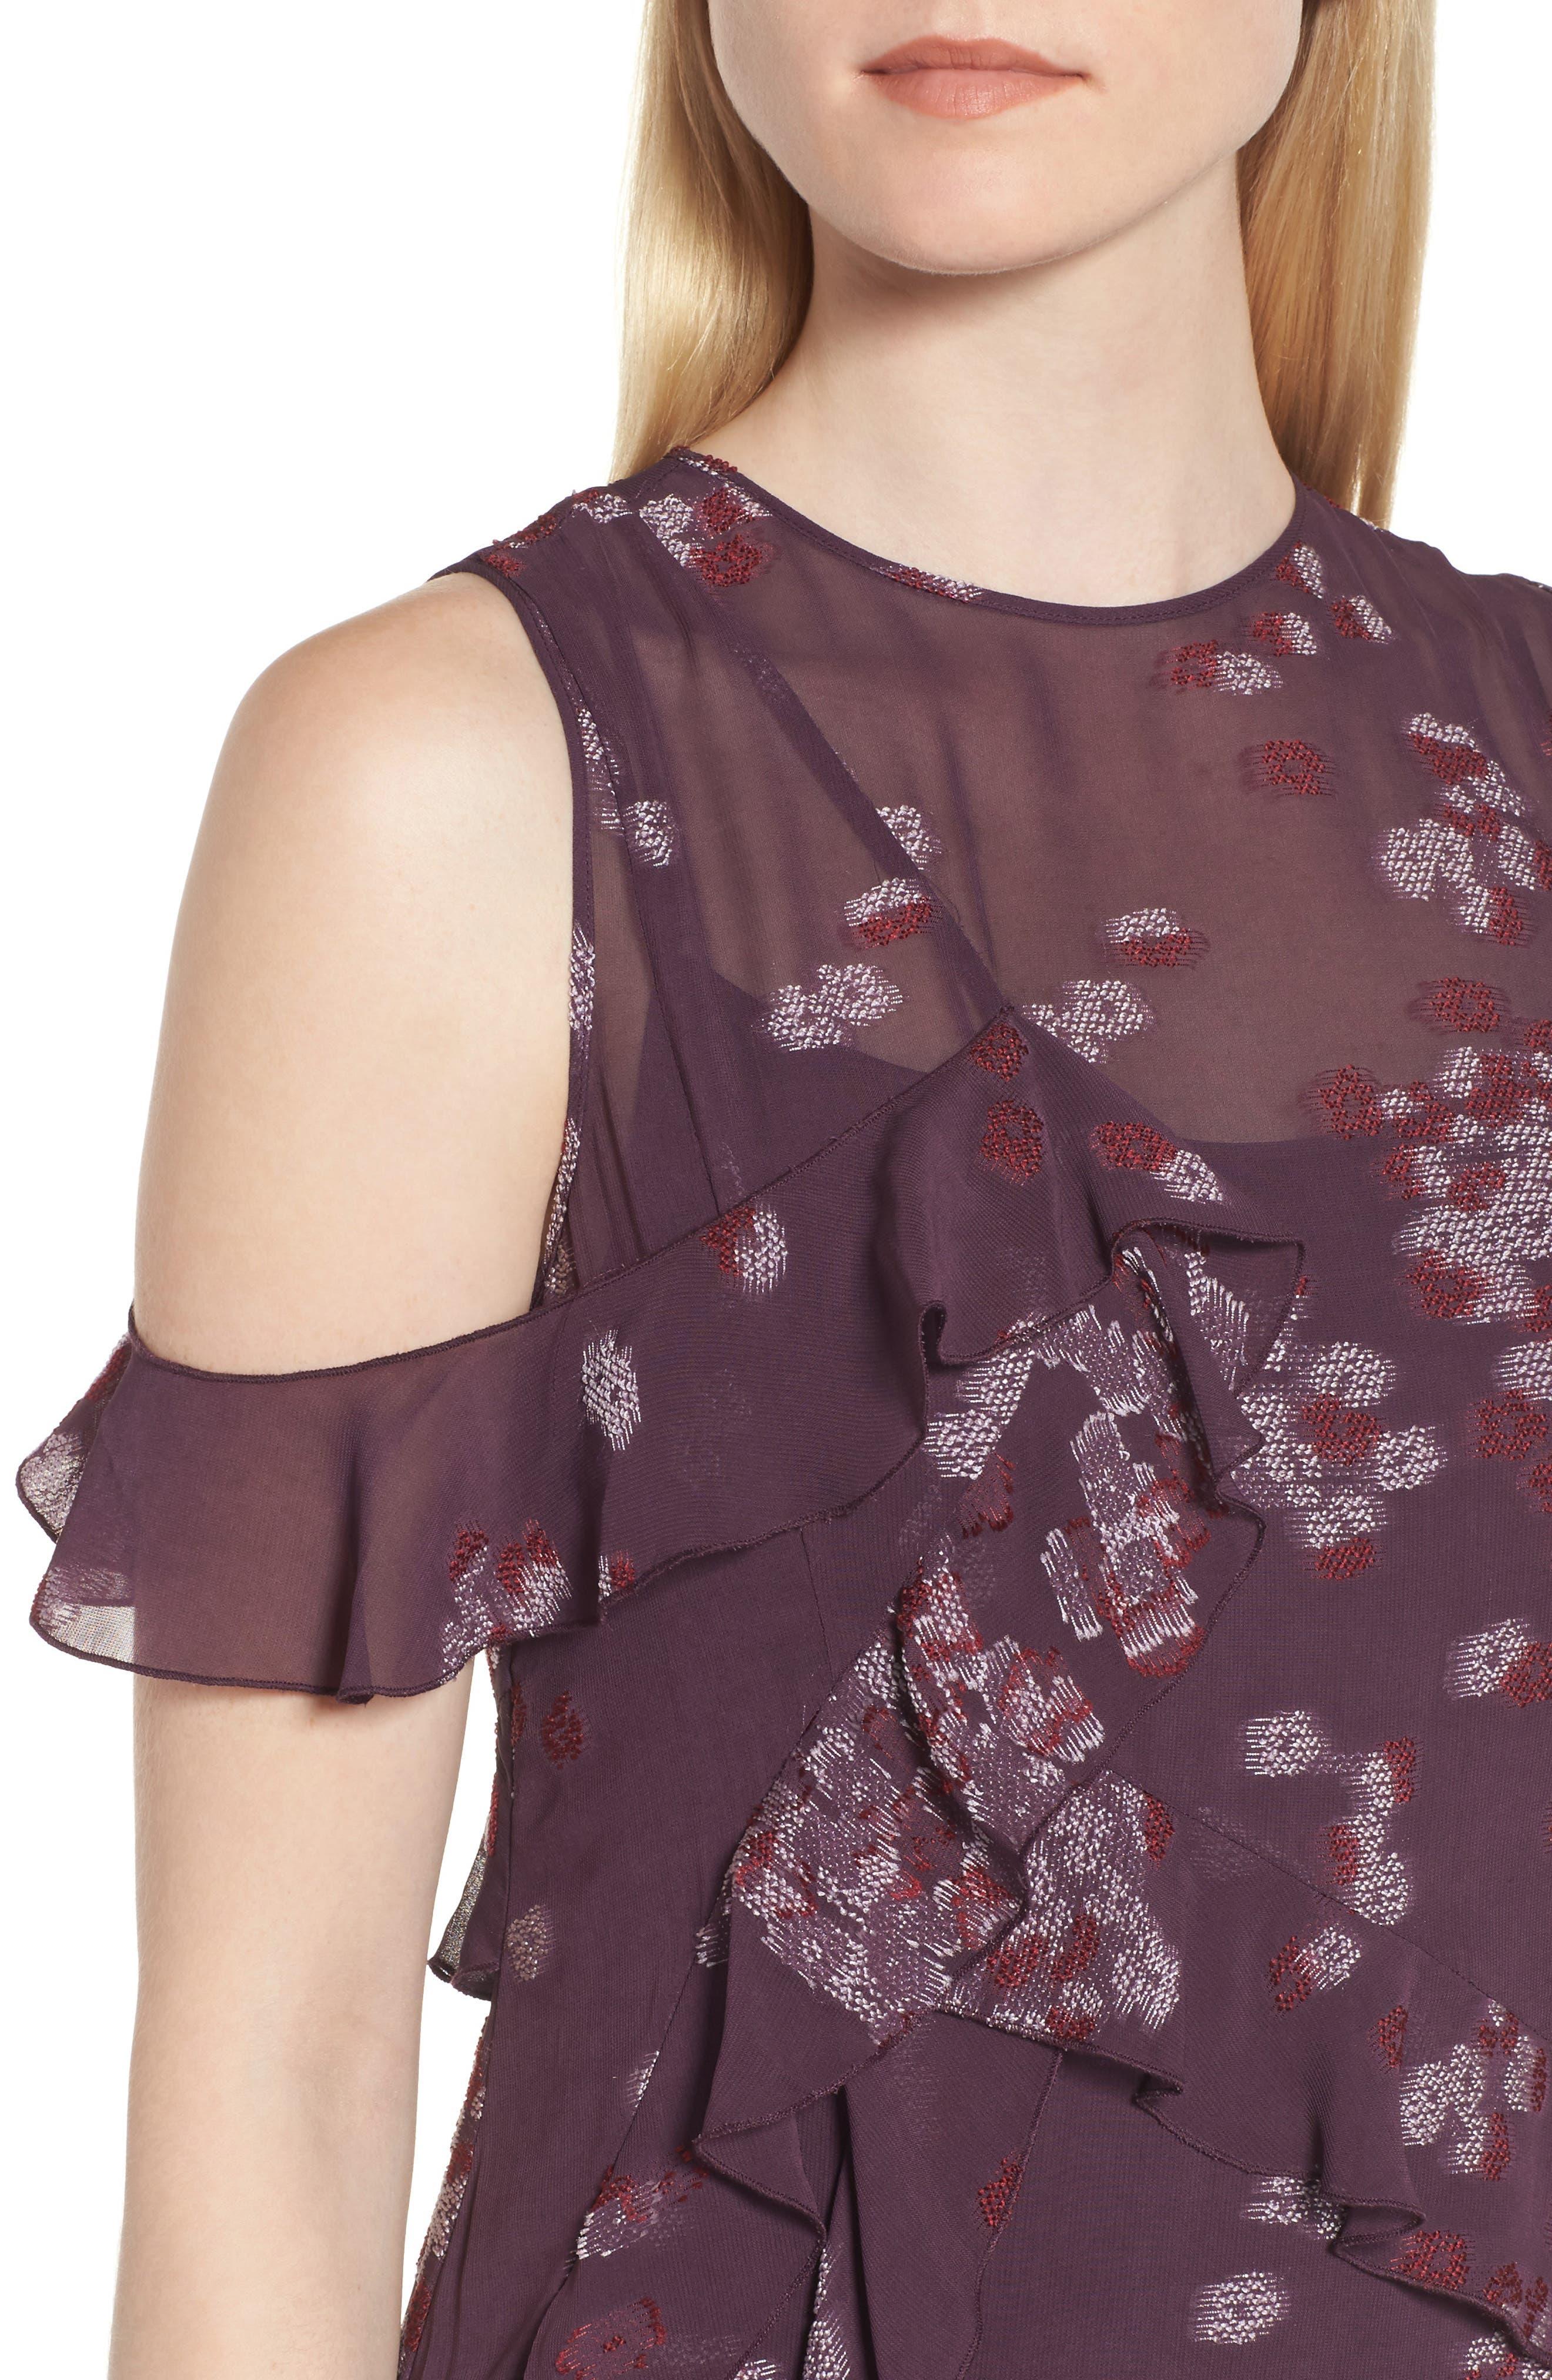 Jacquard Ruffle Dress,                             Alternate thumbnail 4, color,                             Purple Plum Scattered Floral